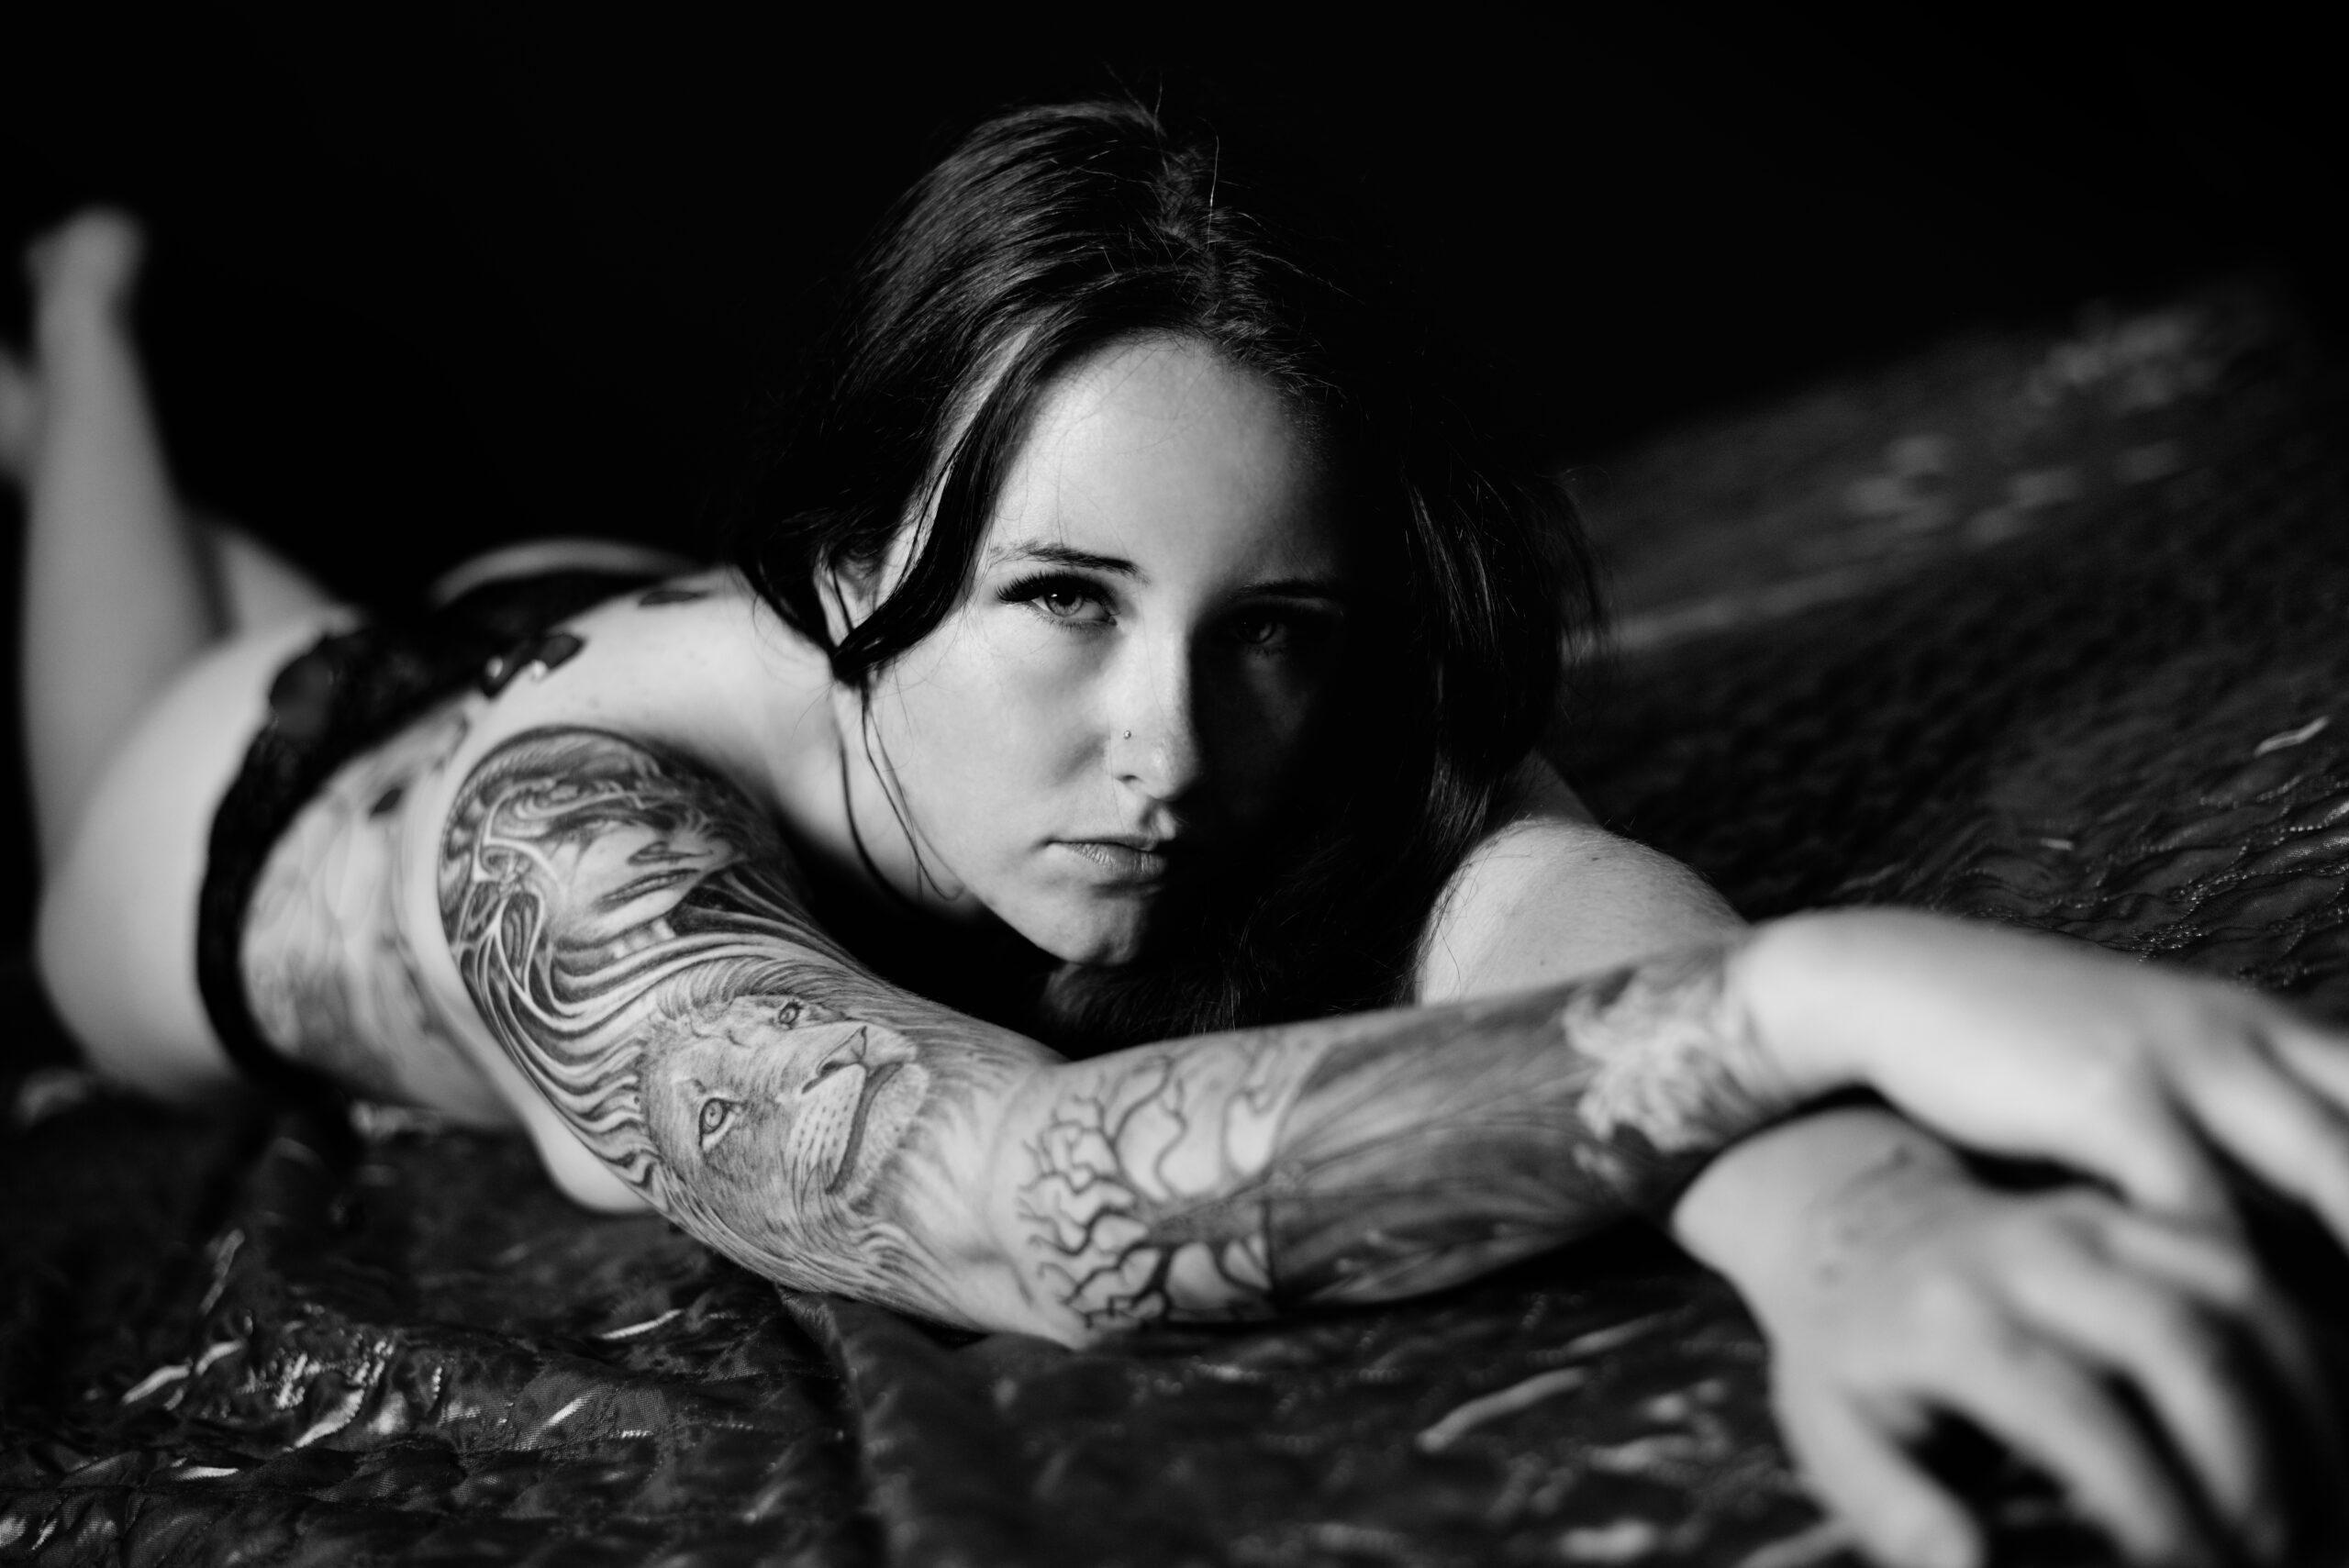 Tattoo artist Alice